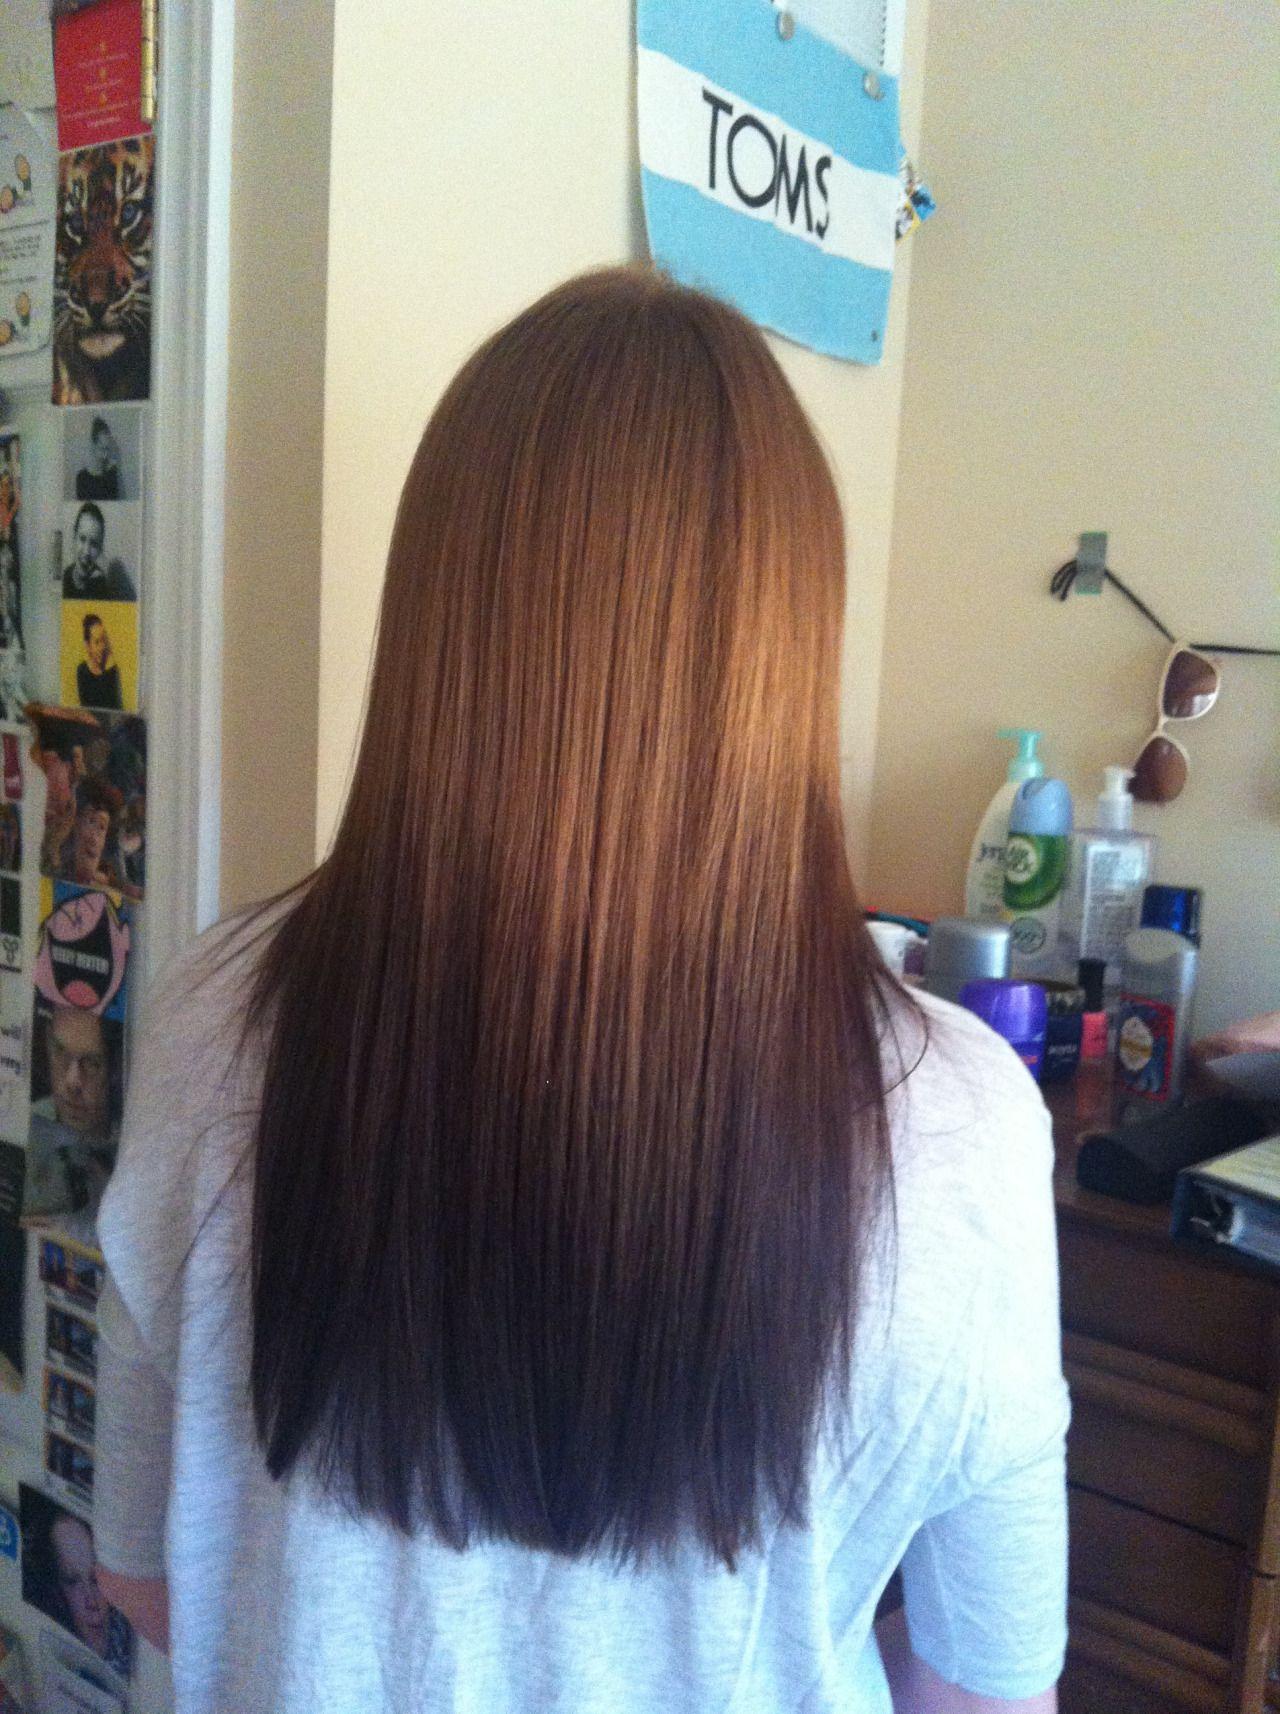 Reverse Ombre Hair Tumblr Hair Pinterest Reverse